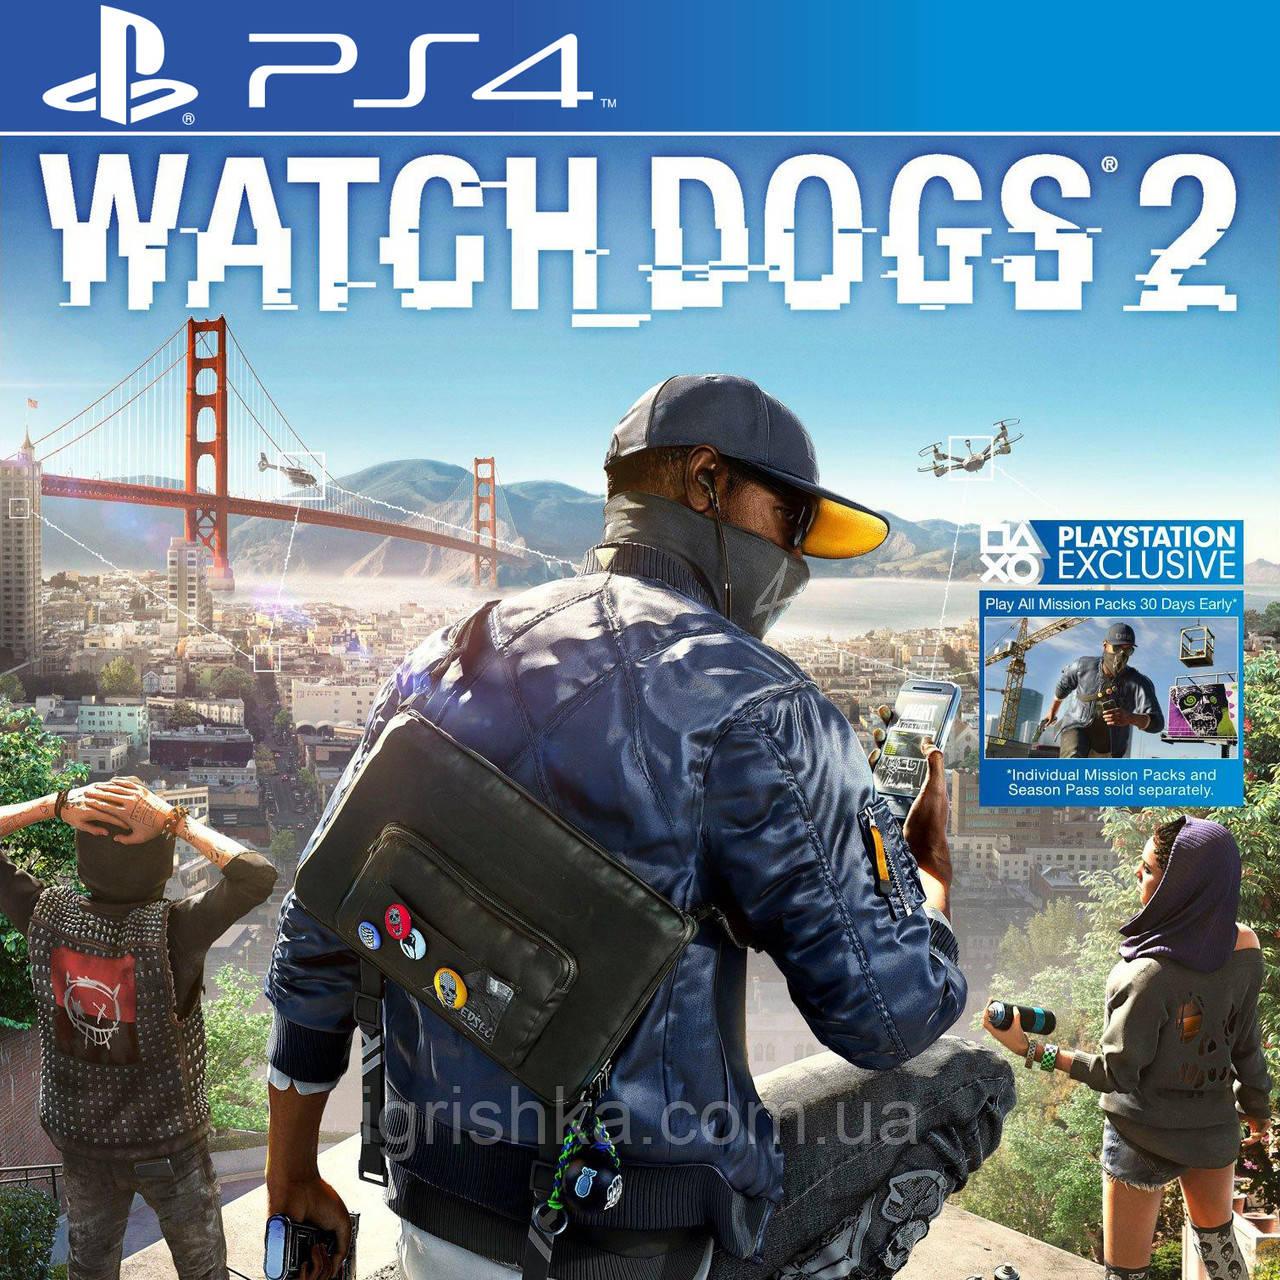 Watch Dogs 2 Ps4 (Цифровой аккаунт для PlayStation 4) П3